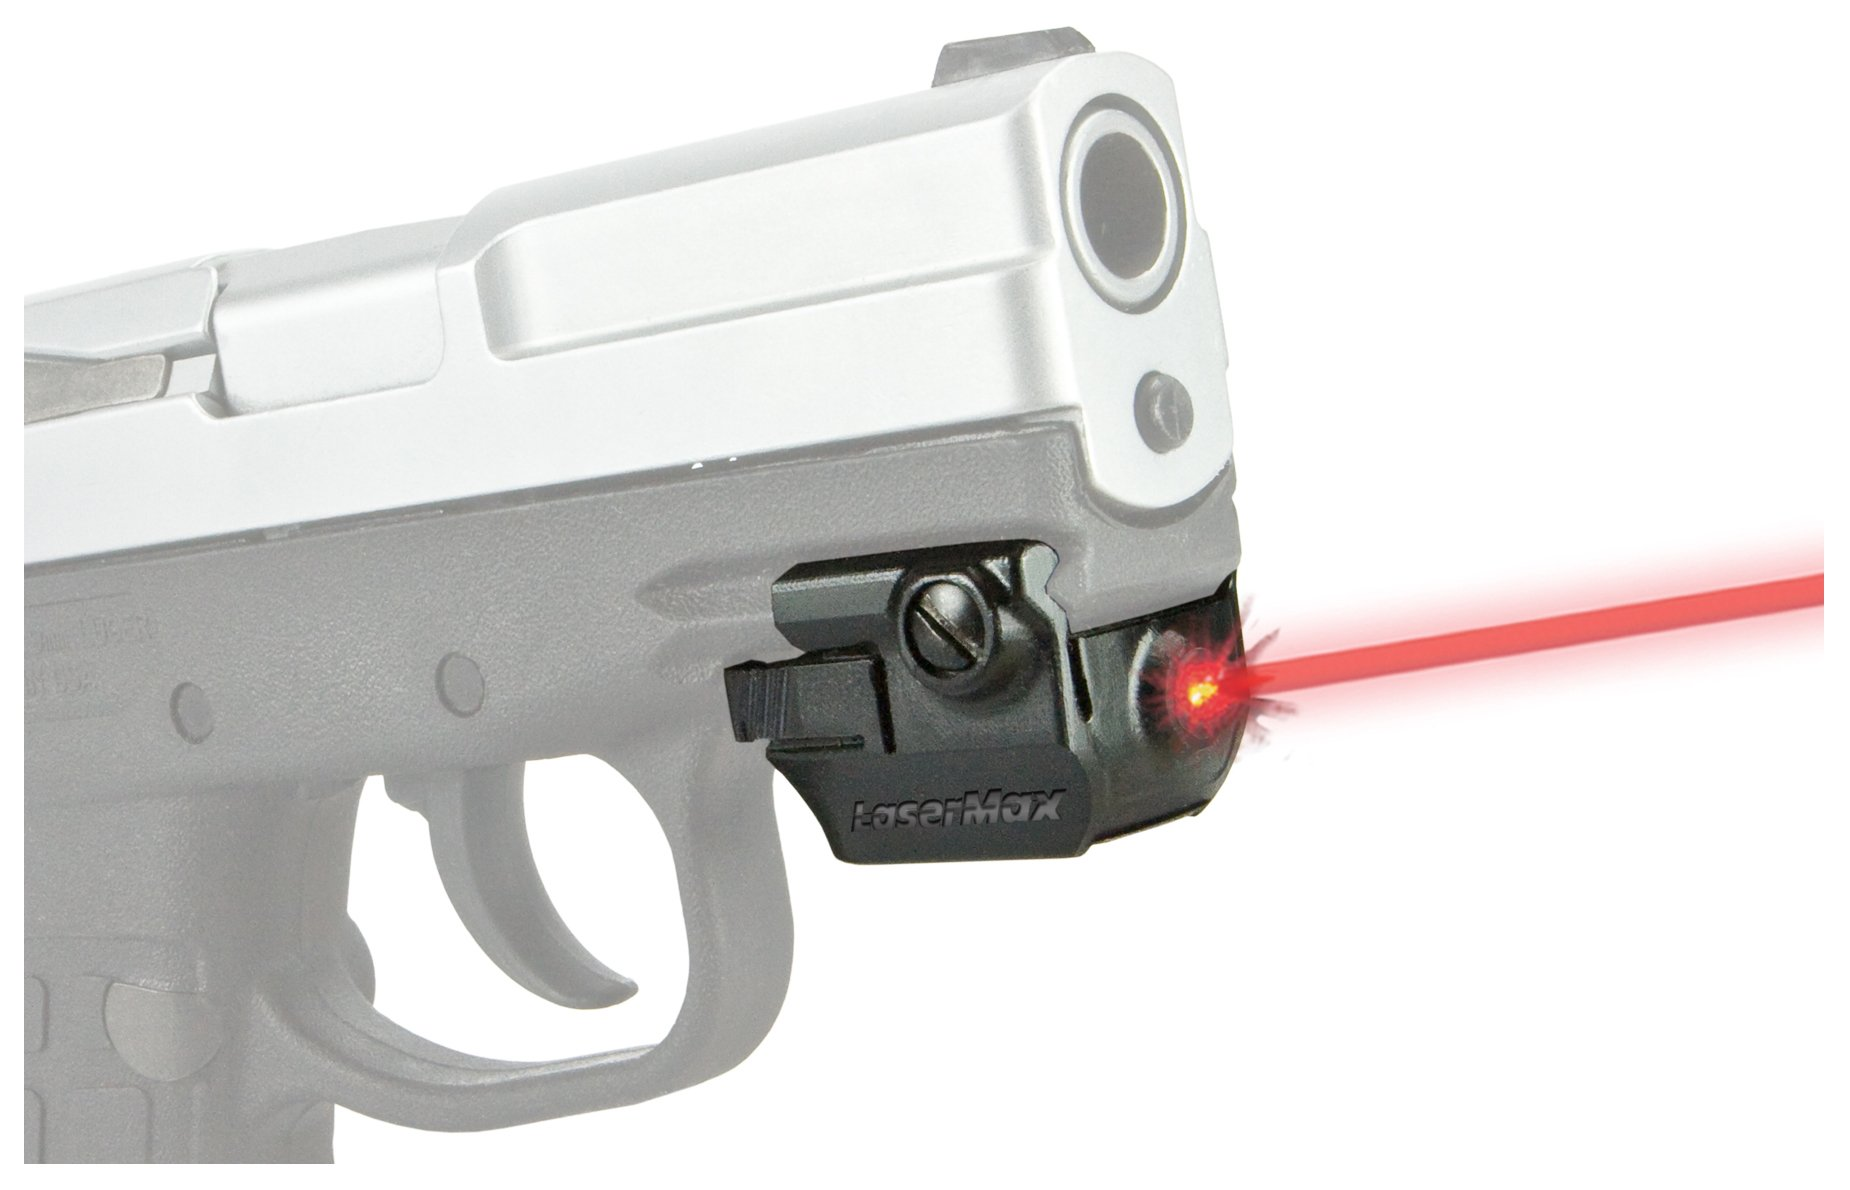 Lasermax Uni-Max Micro Red Laser